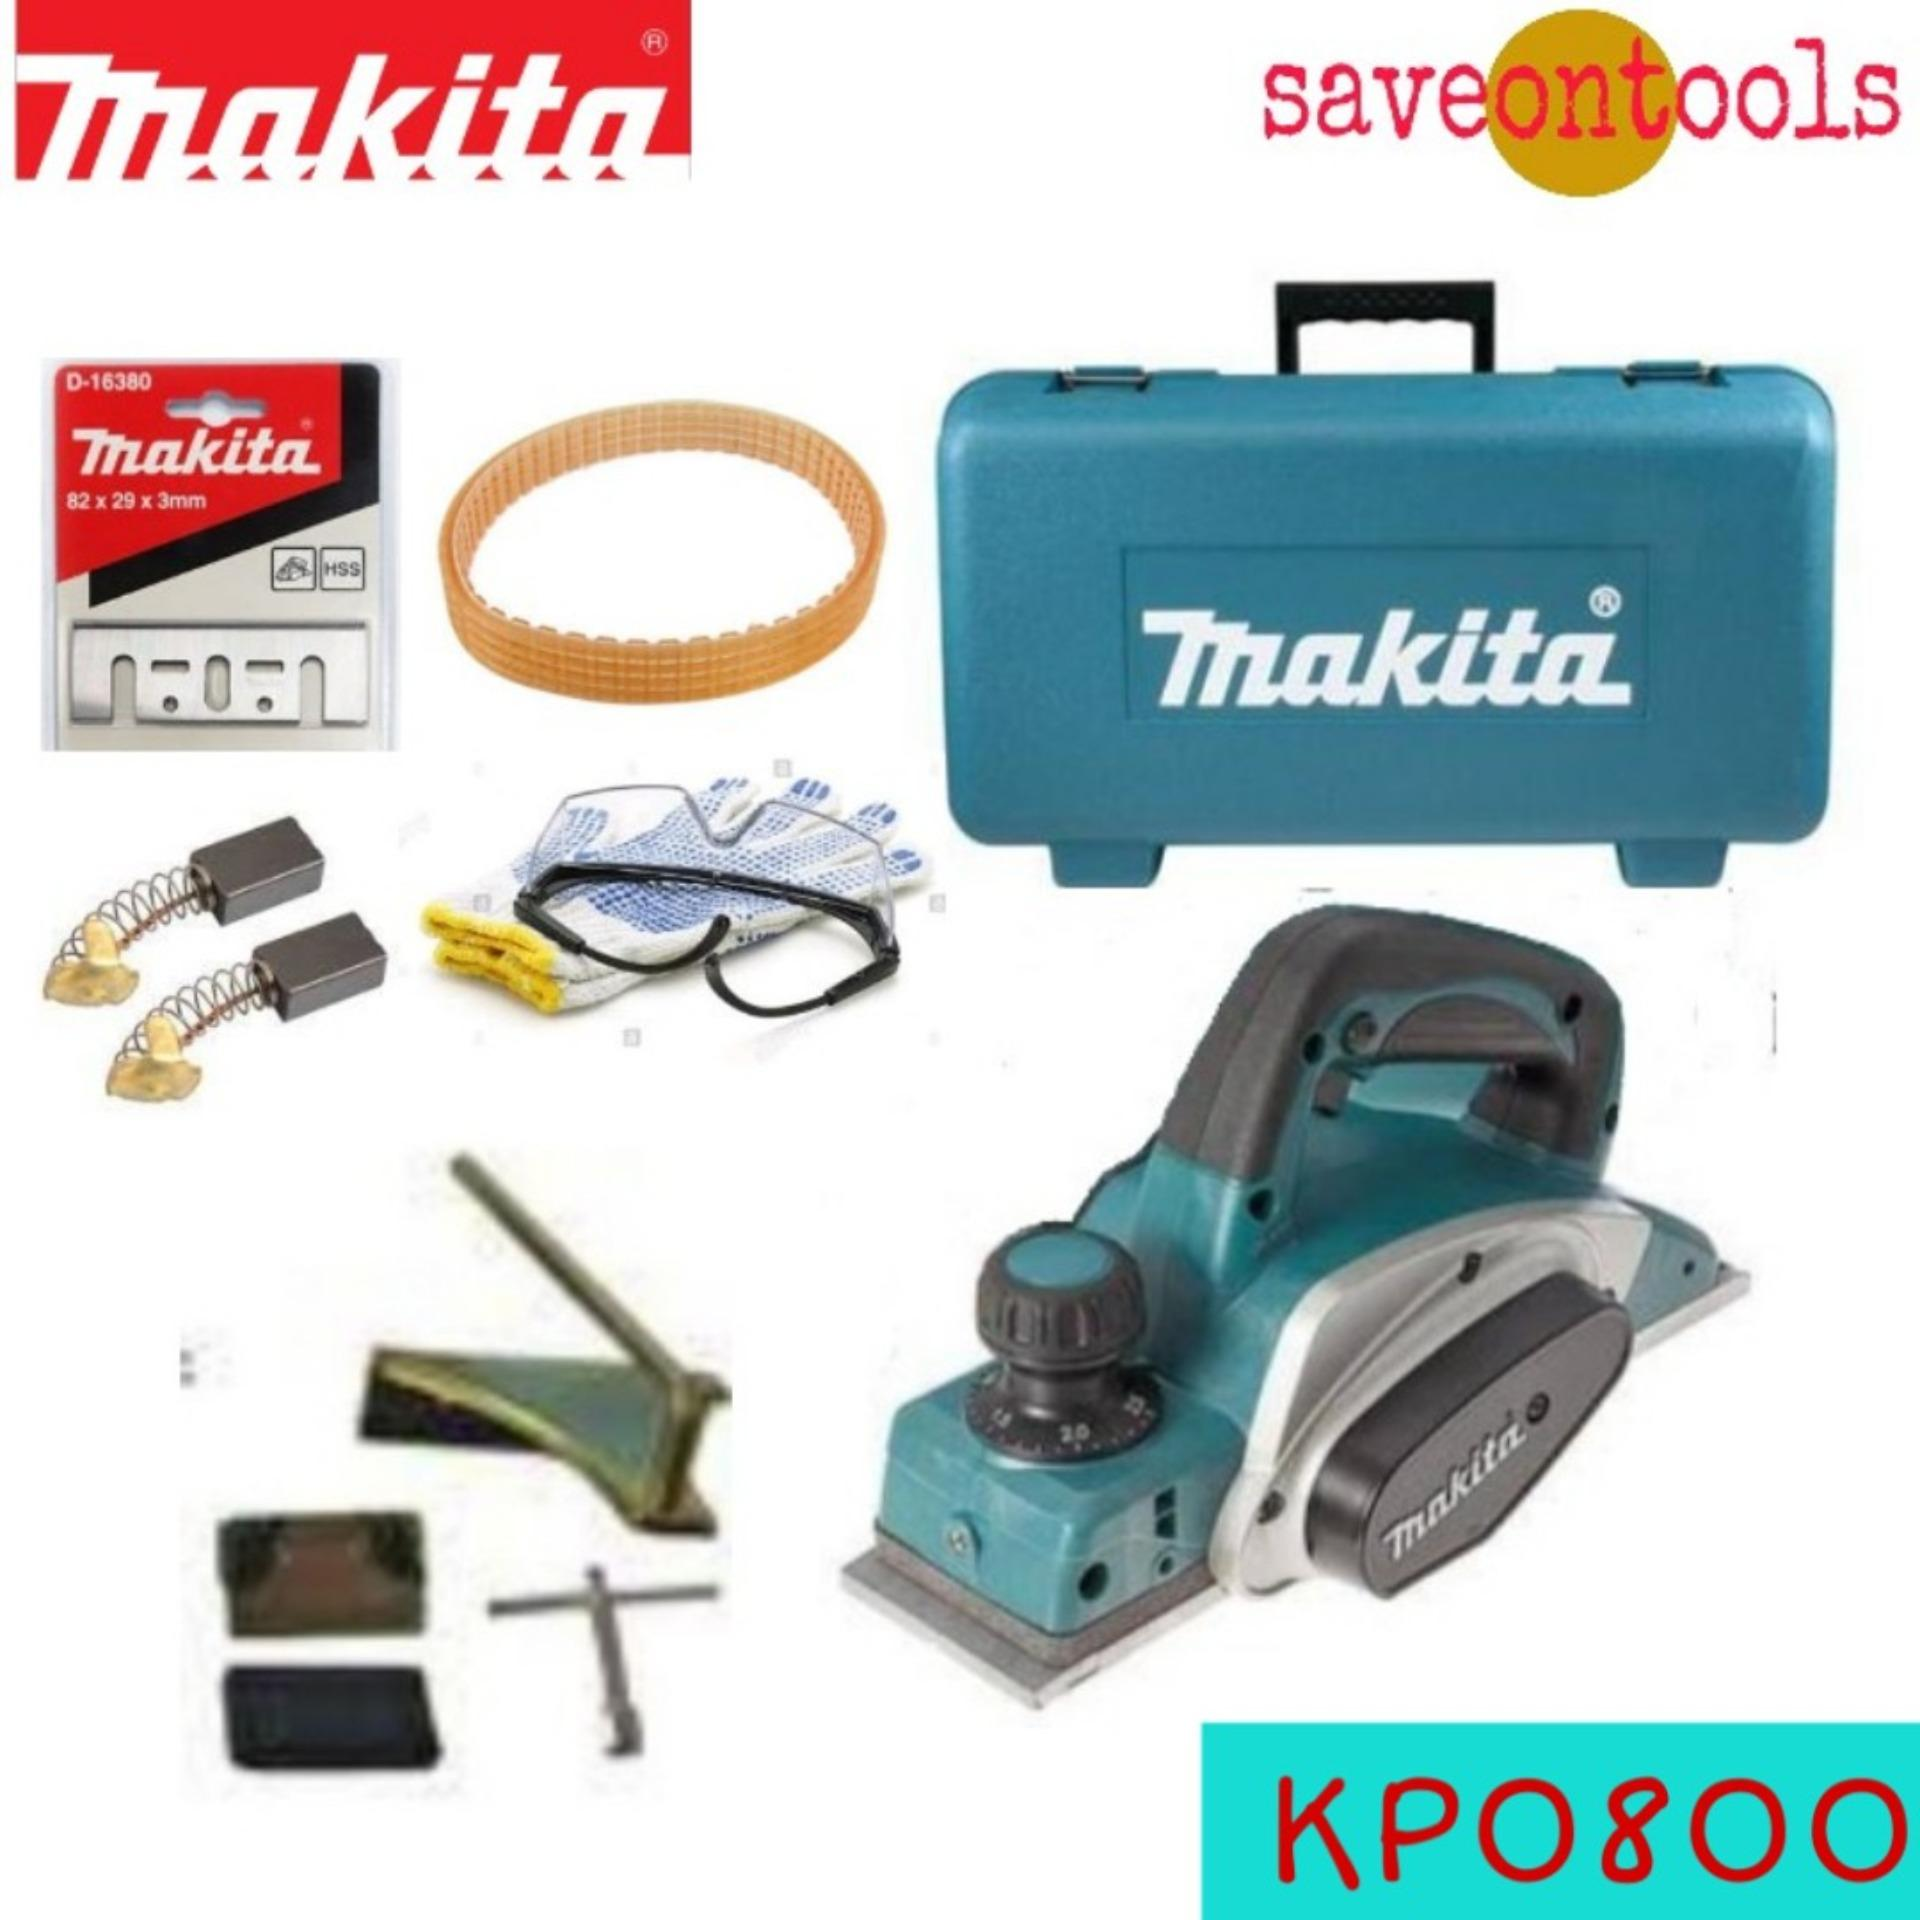 Makita Planer Electric with Extra Makita Blade Carbon Brush Belt Freebies